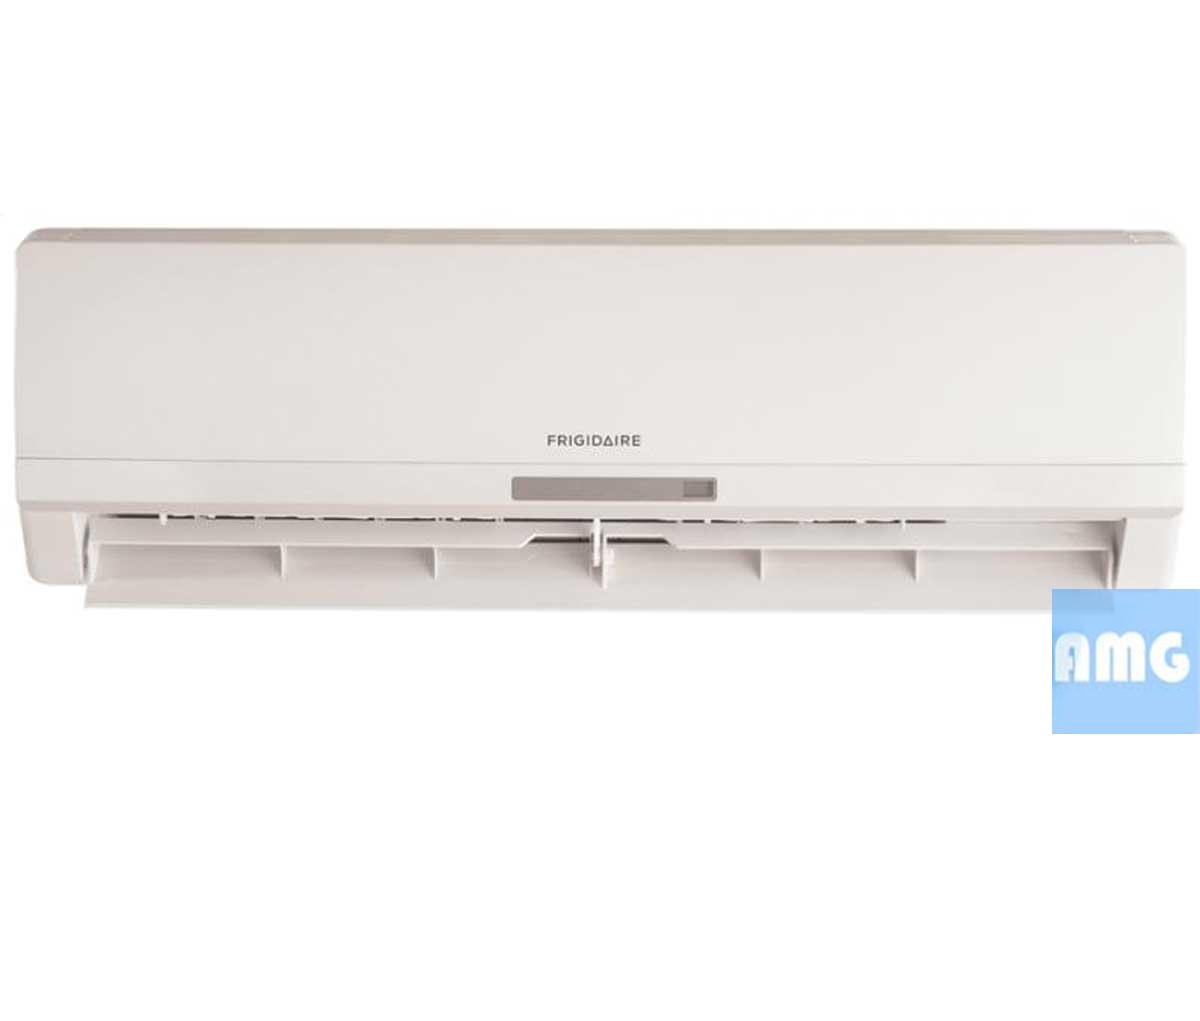 medium resolution of frigidaire ductless 9k mini split heat pump frs09pys1 front view